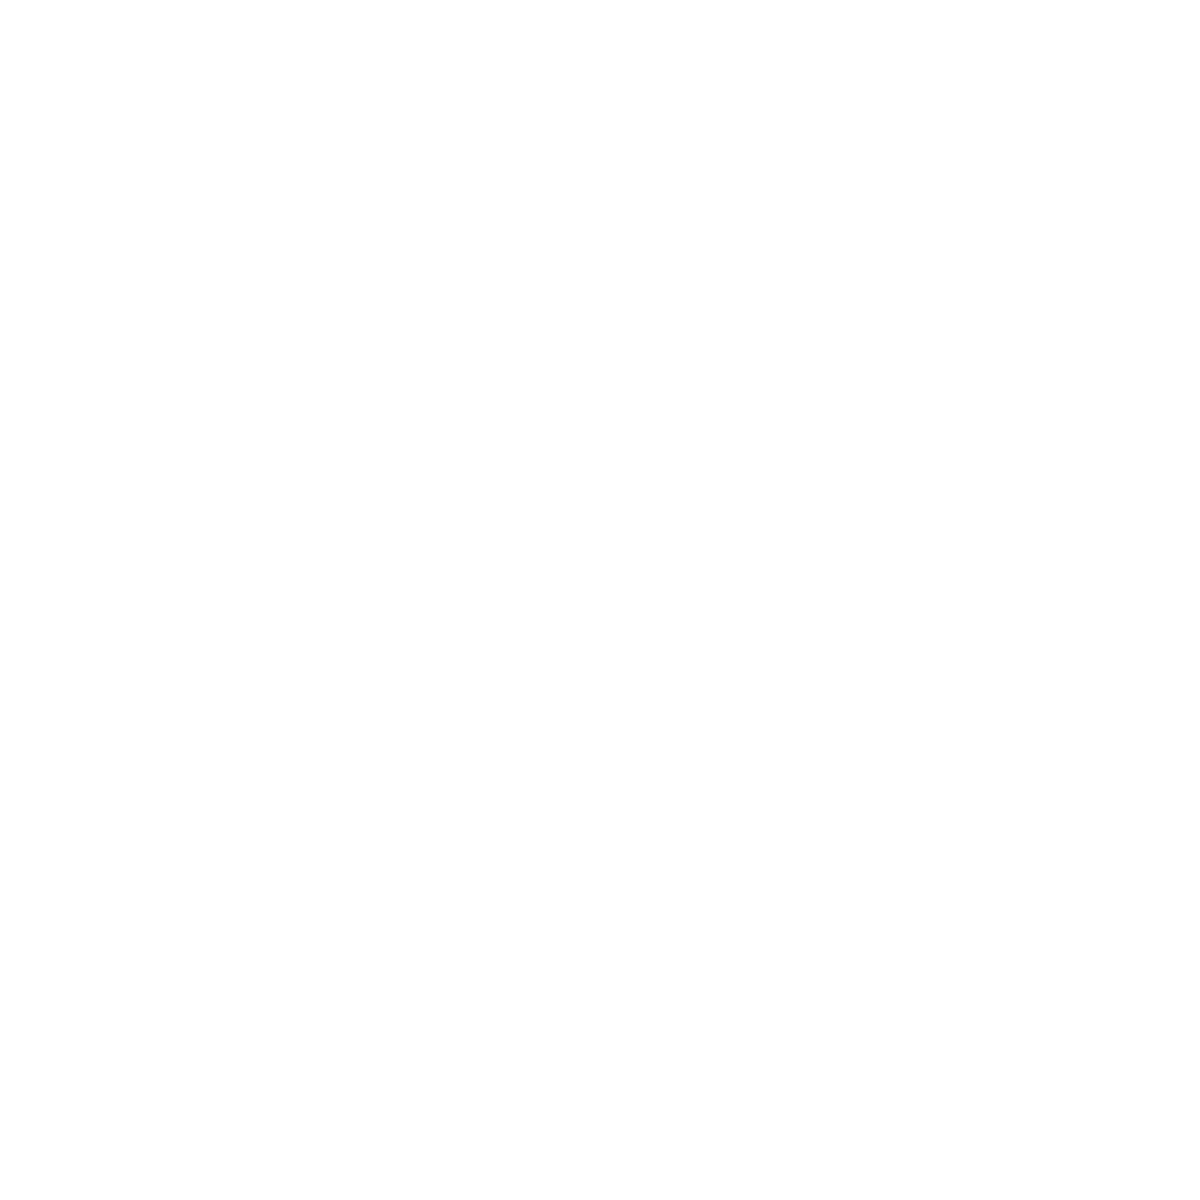 Go! Southampton